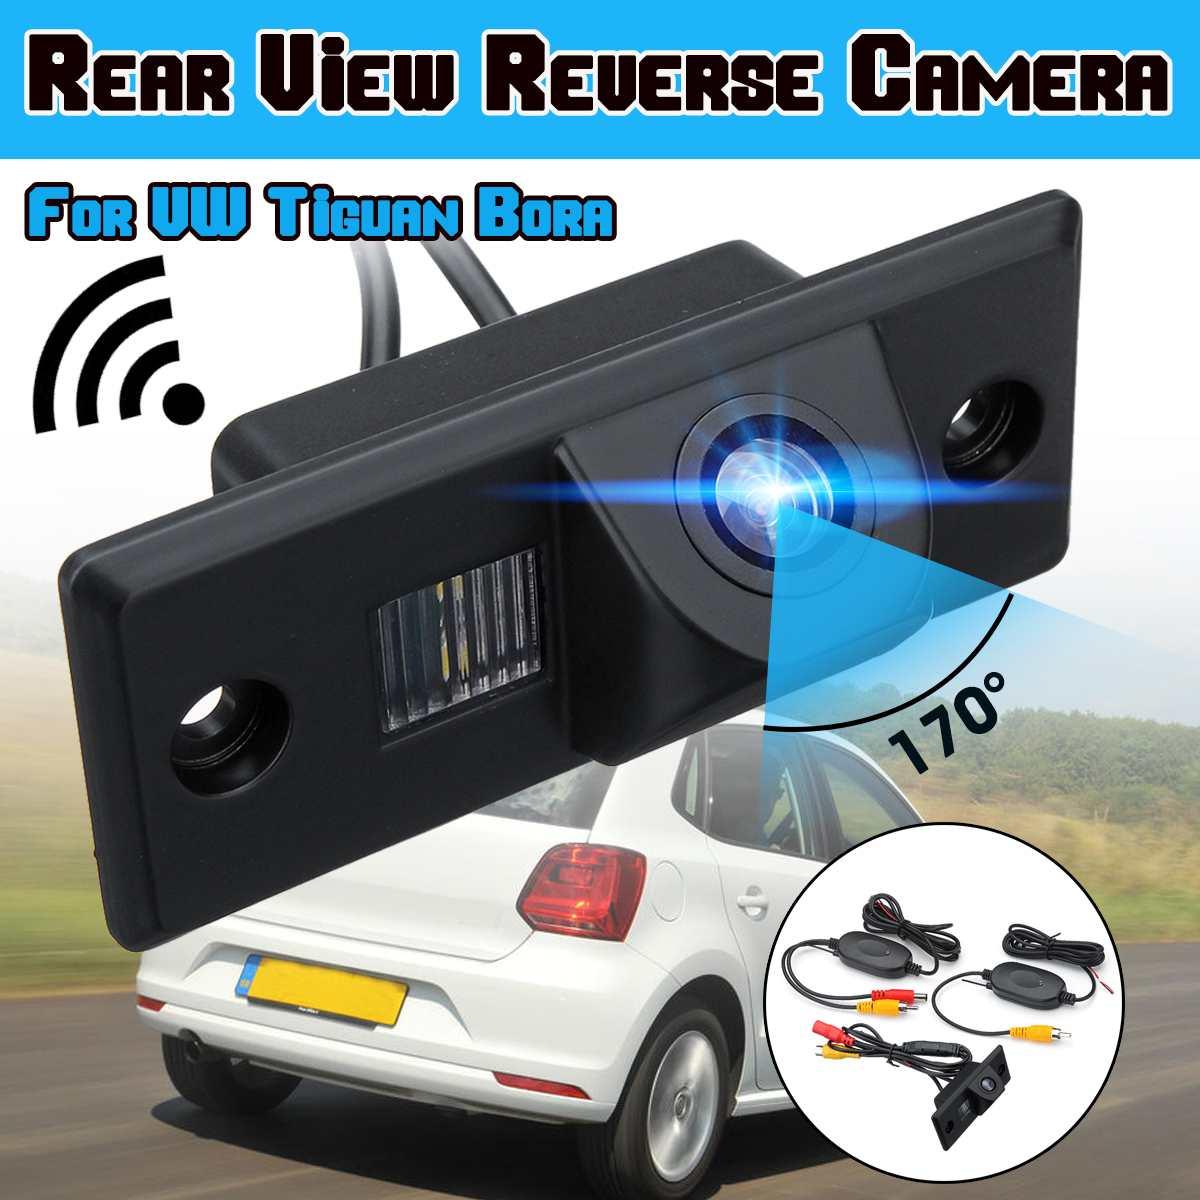 Car Rear View Camera Reverse Backup Parking For VW Tiguan Golf Mk4 Bora Polo Passat Jetta Porsche Cayenne Skoda Fabia Yeti